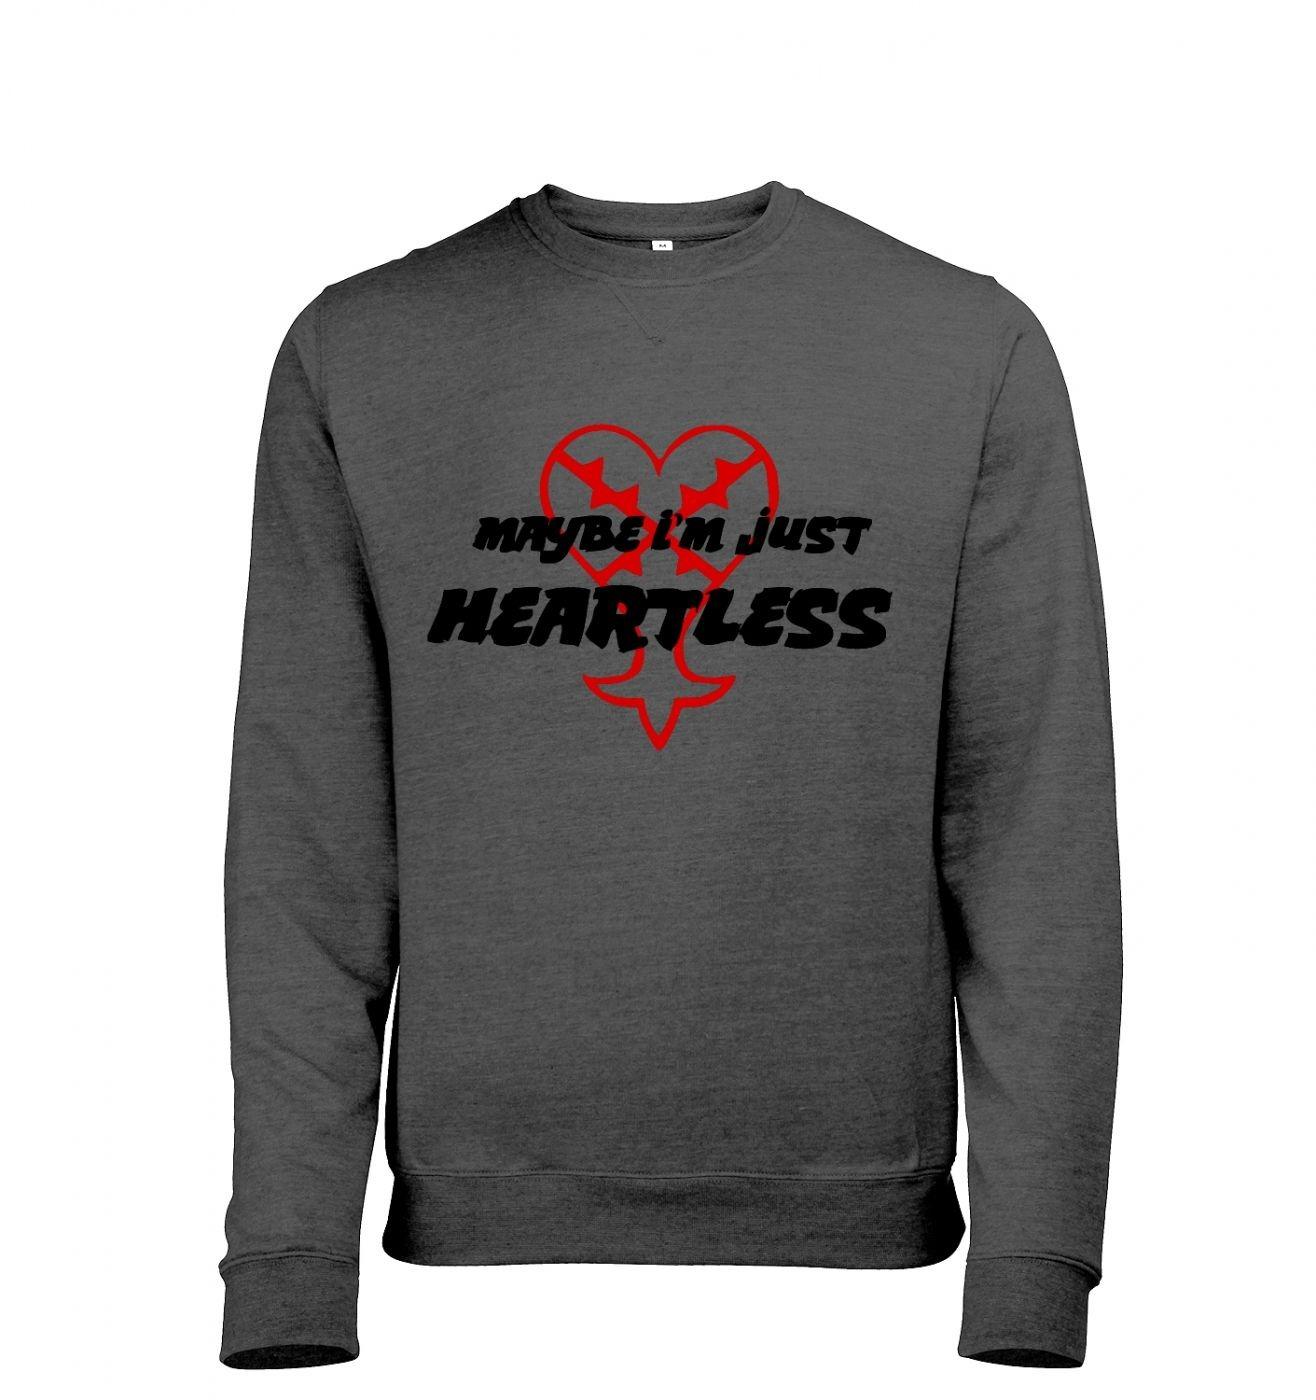 Maybe I'm Just Heartless men's heather sweatshirt